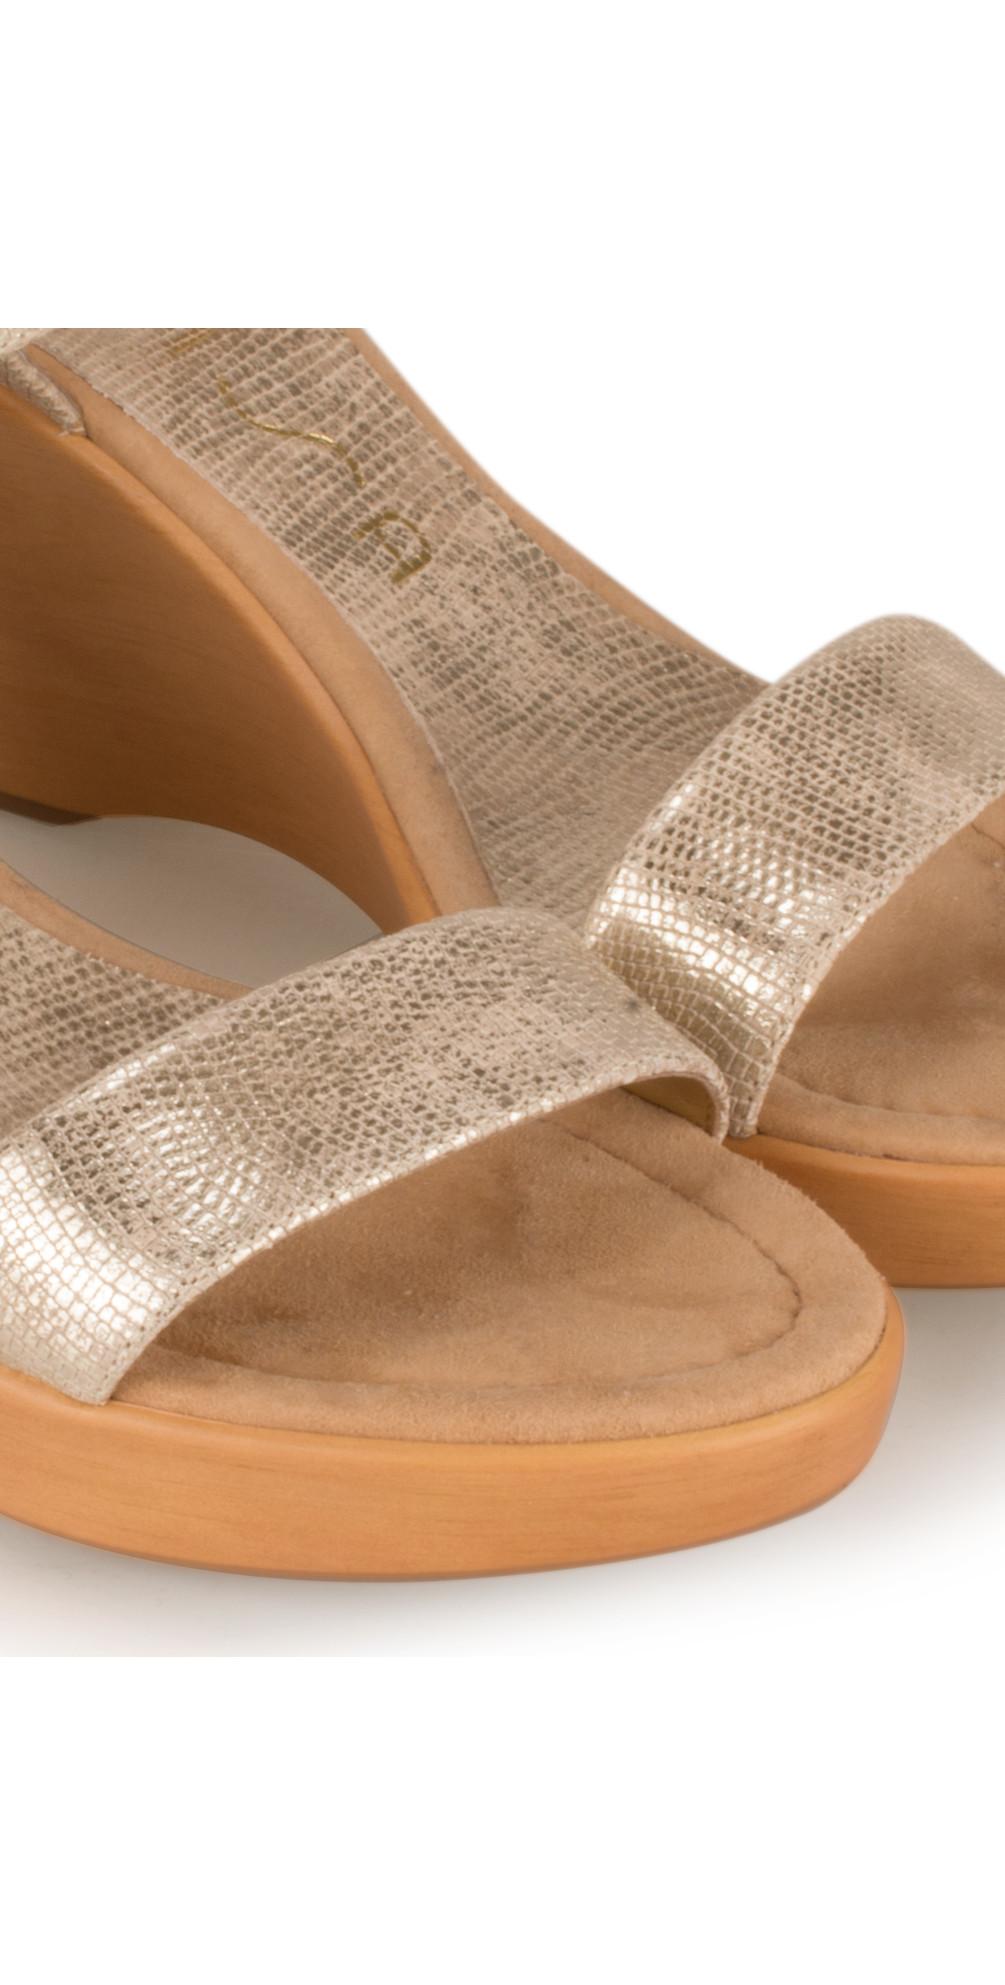 0feadc254 Unisa Shoes Rita Metallic Wedge Sandal in Platino Platinum